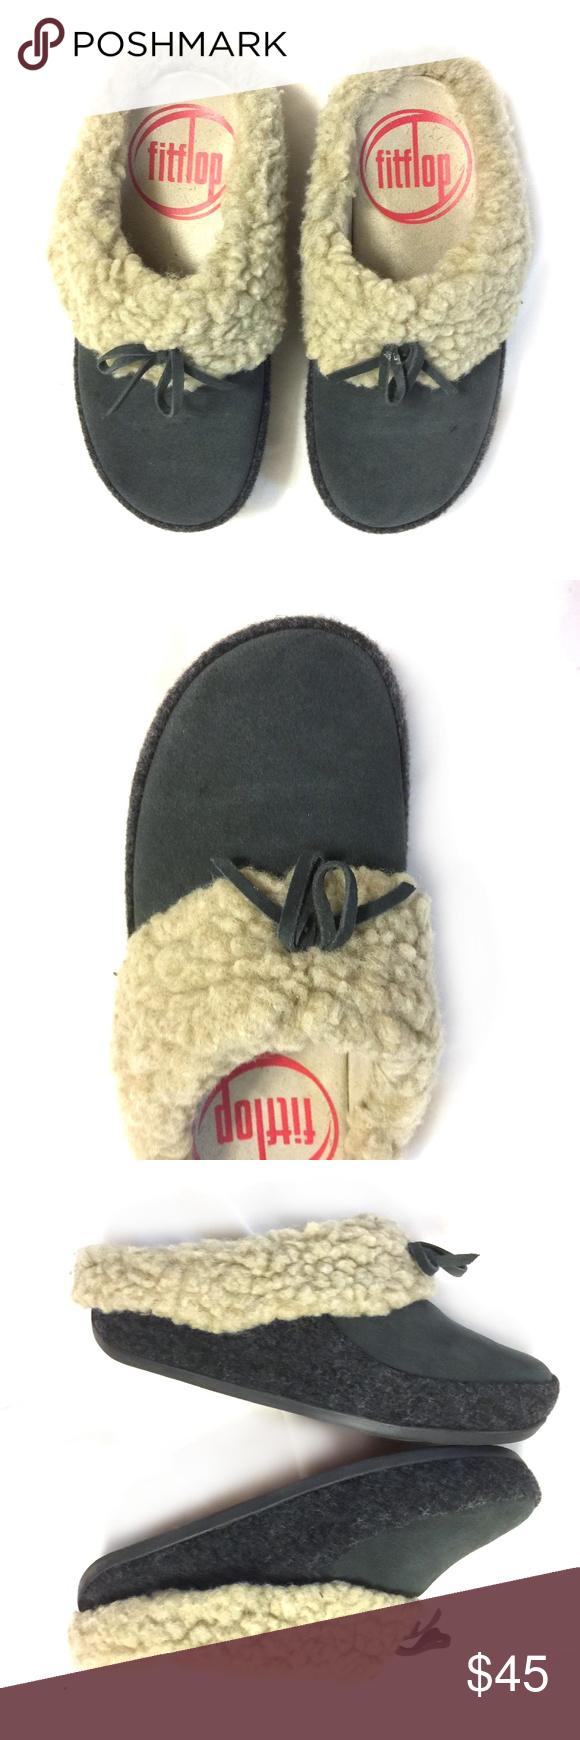 599b3d57826 FITFLOP Women's The Cuddler Slippers/ Sz 6 & 6.5 Soft, pillow-padded ...